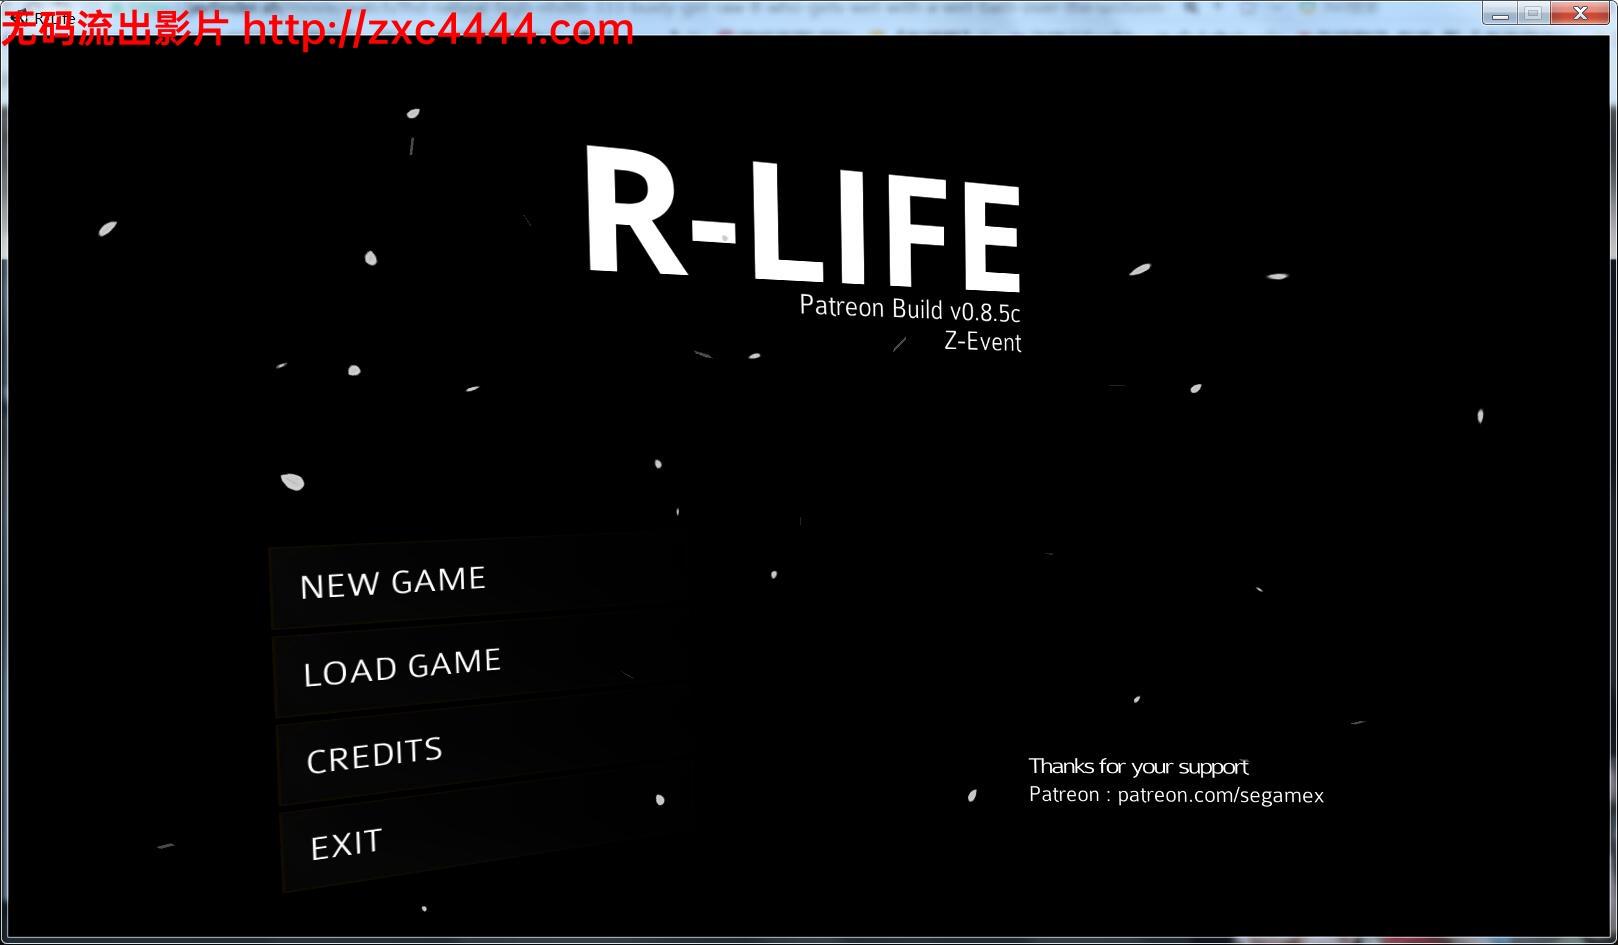 R-LIFE~和蕾姆一起荒岛求生 Ver0.8.5b 【更新/ACT/3D/动态CG/4.2G】10-28-01